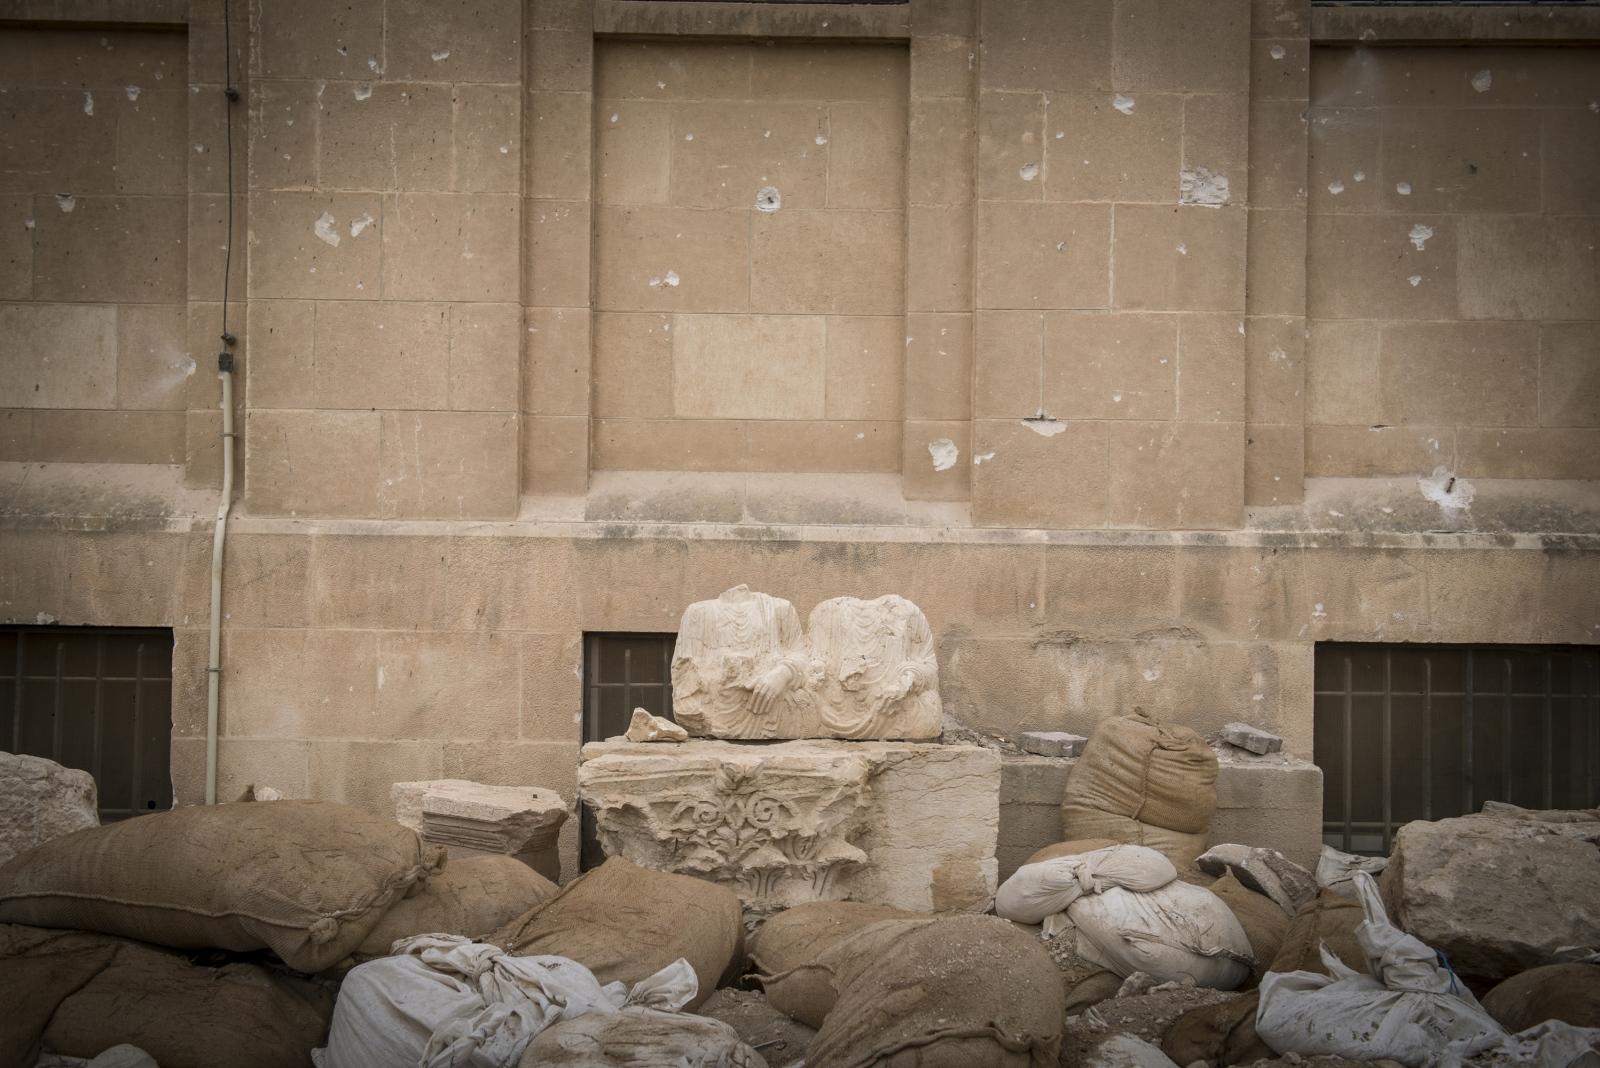 Art and Documentary Photography - Loading Cio___che_resta_di_Palmyra_15.jpg